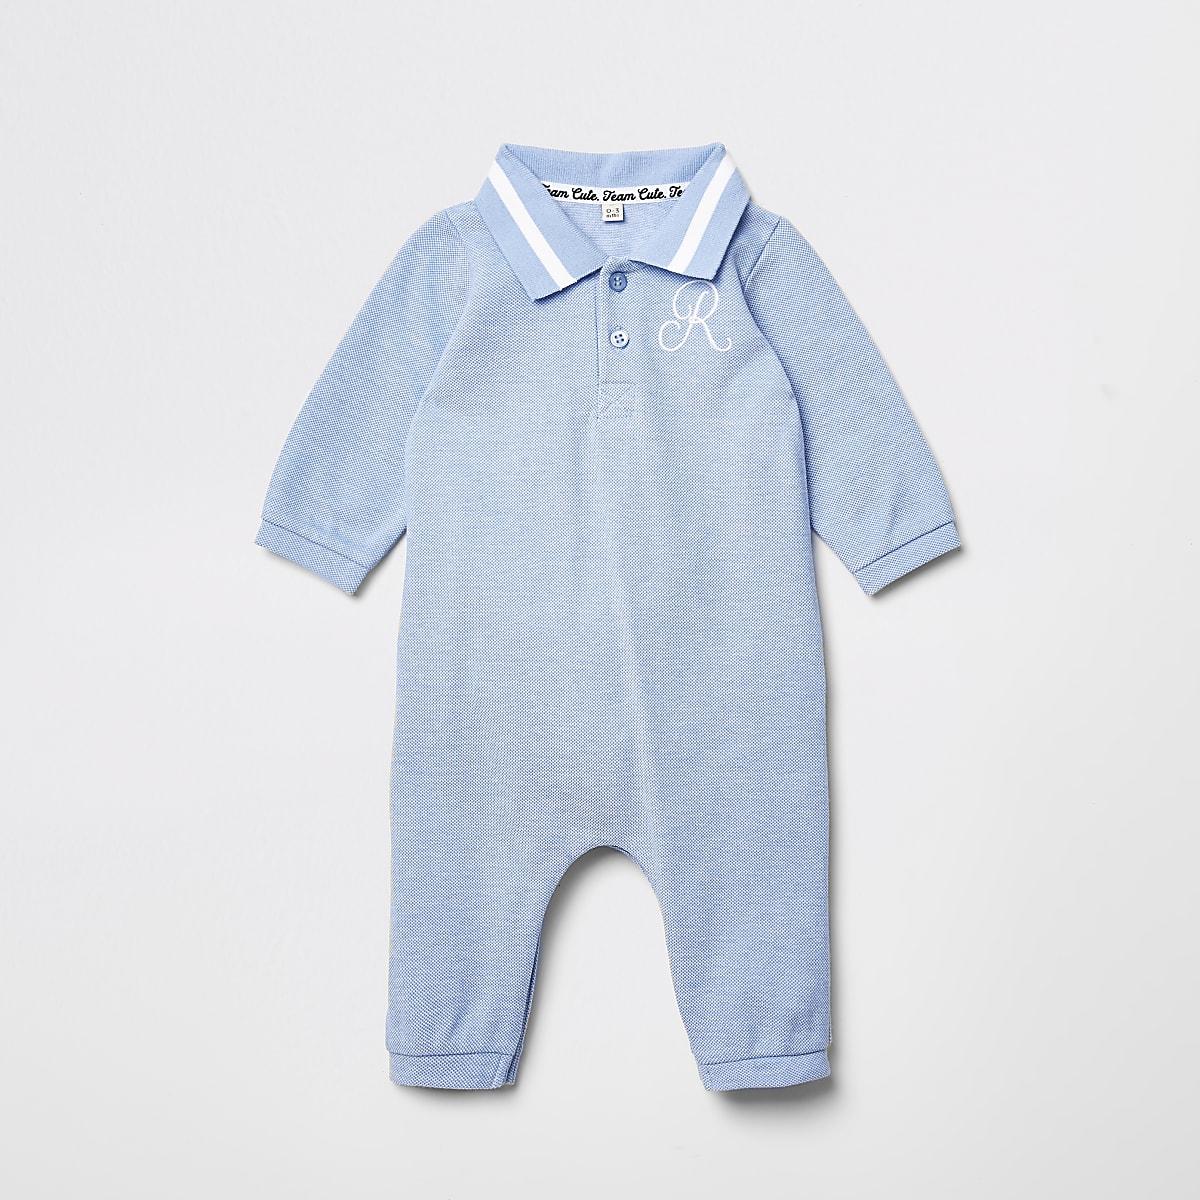 Blauwe babygrow met kraag met geborduurd R-monogram voor baby's